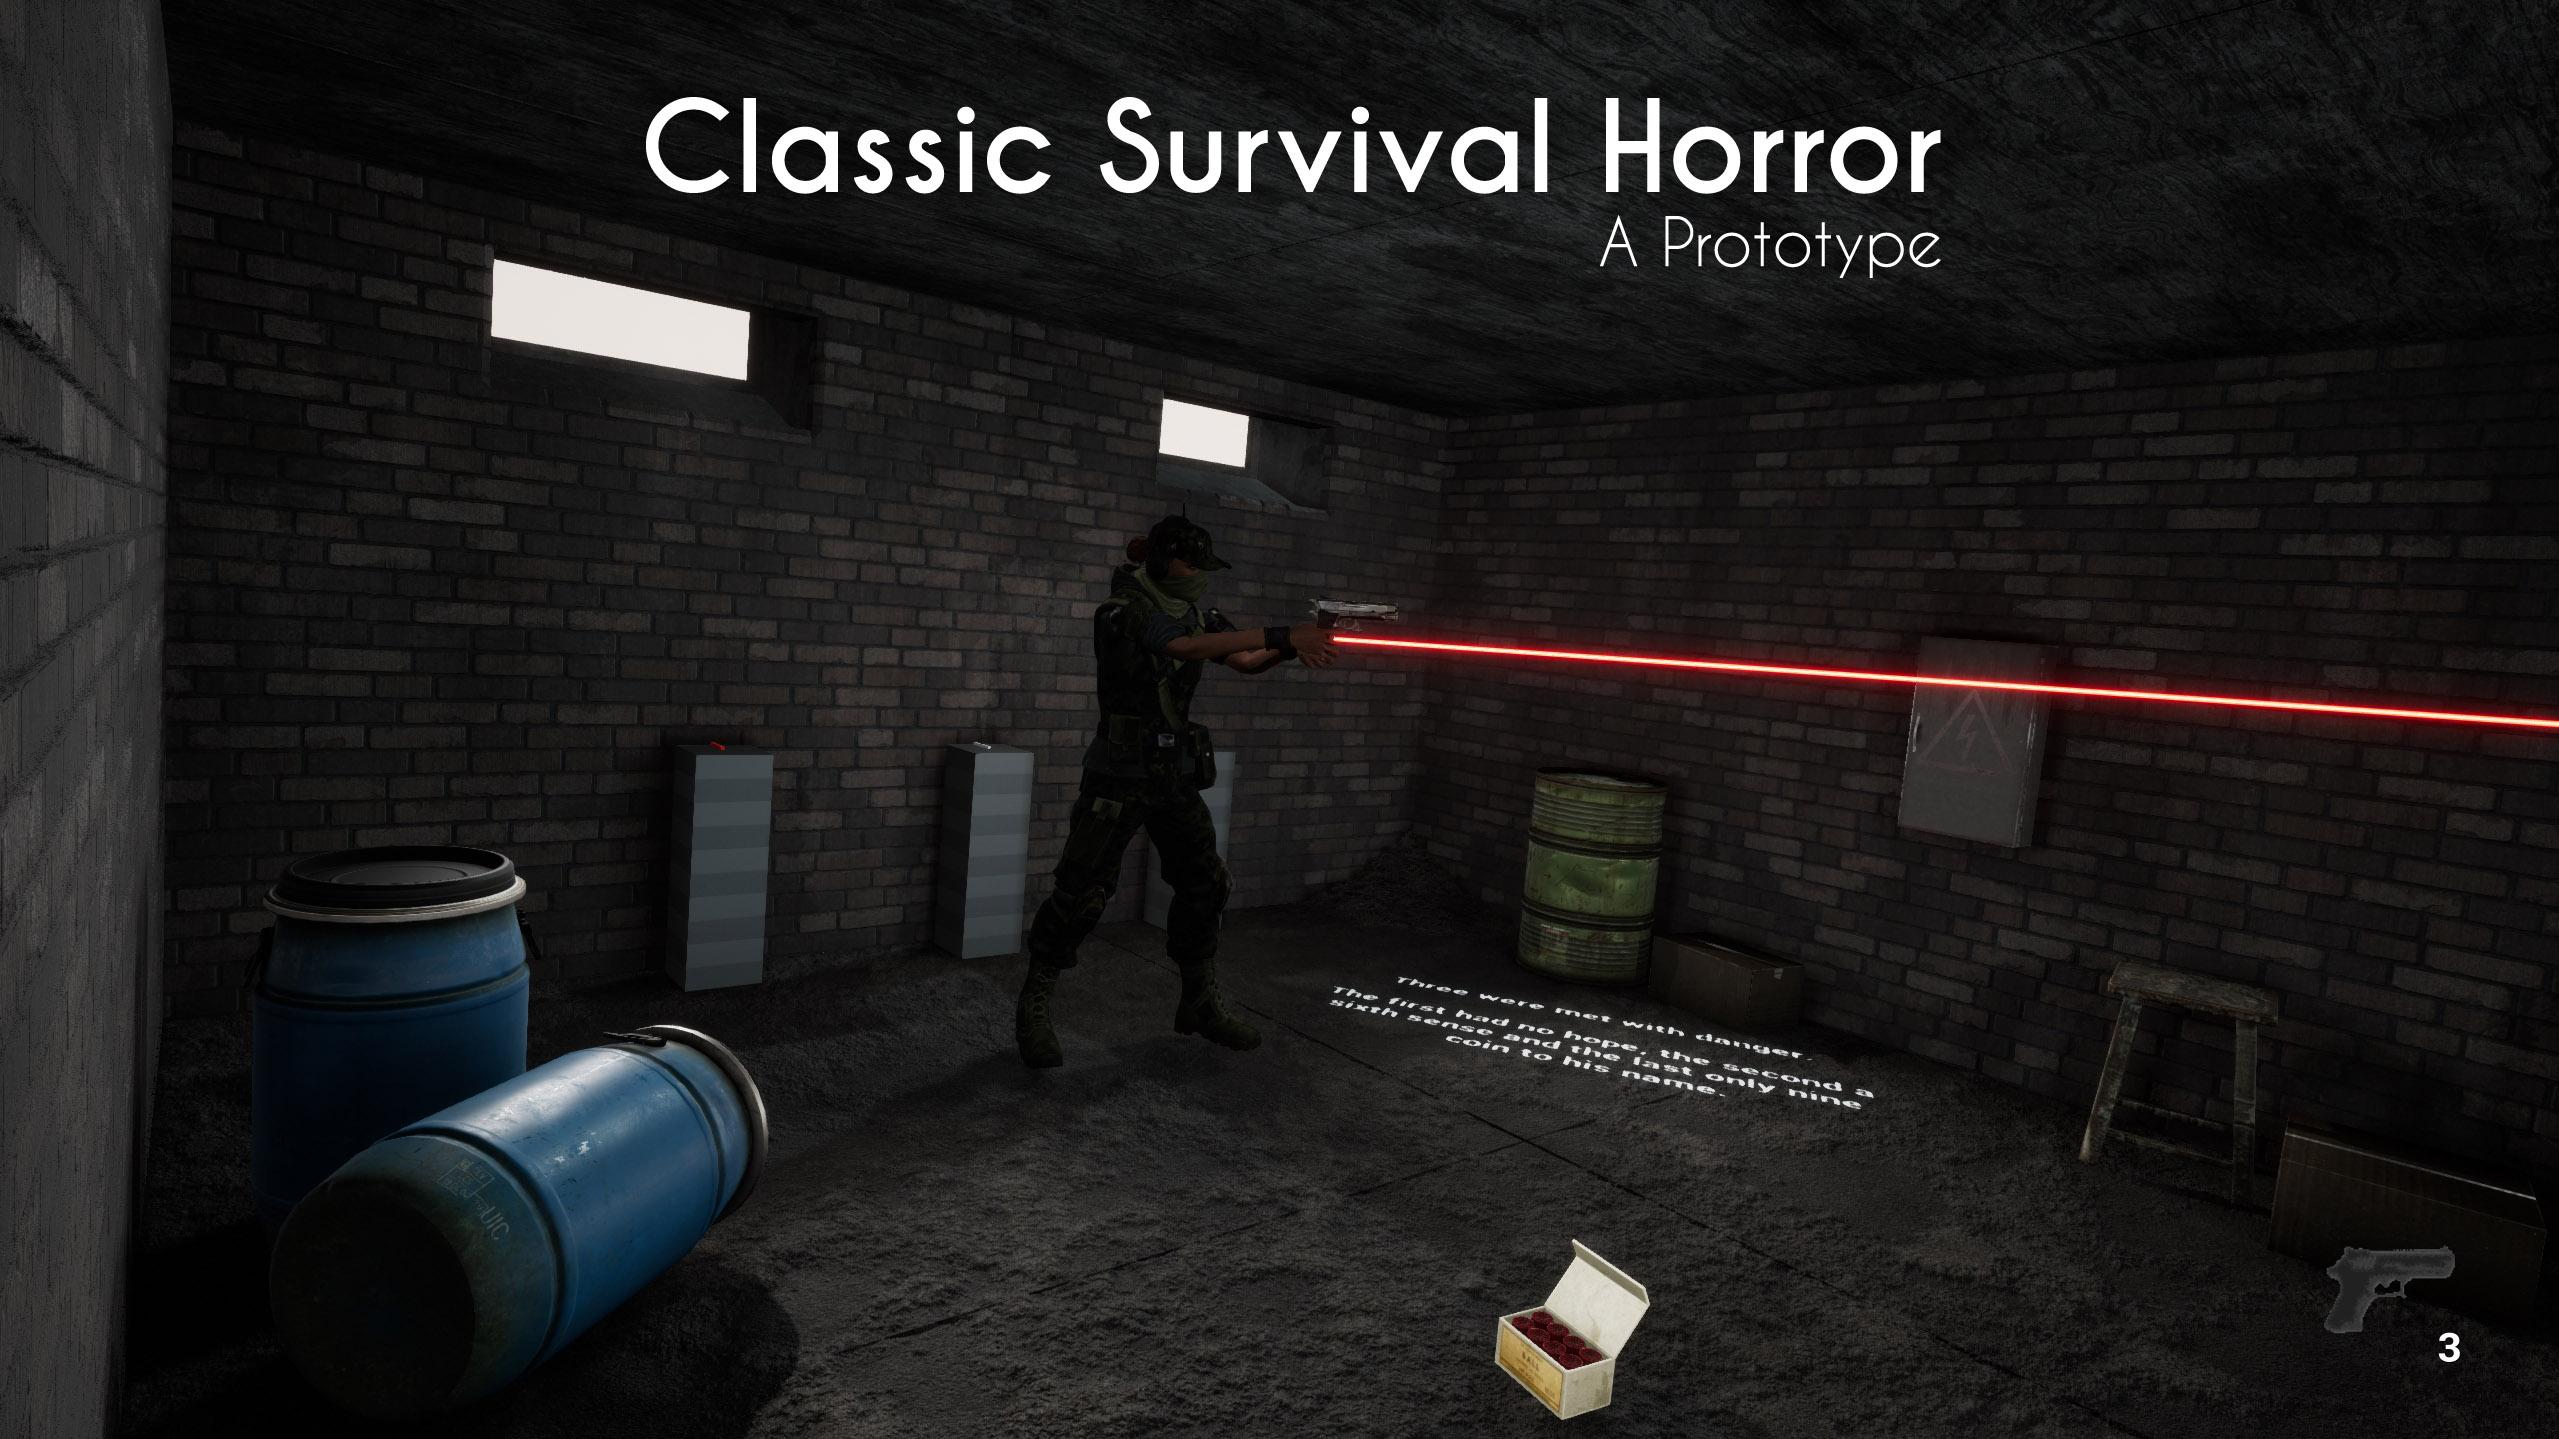 Classic Survival Horror (Prototype)